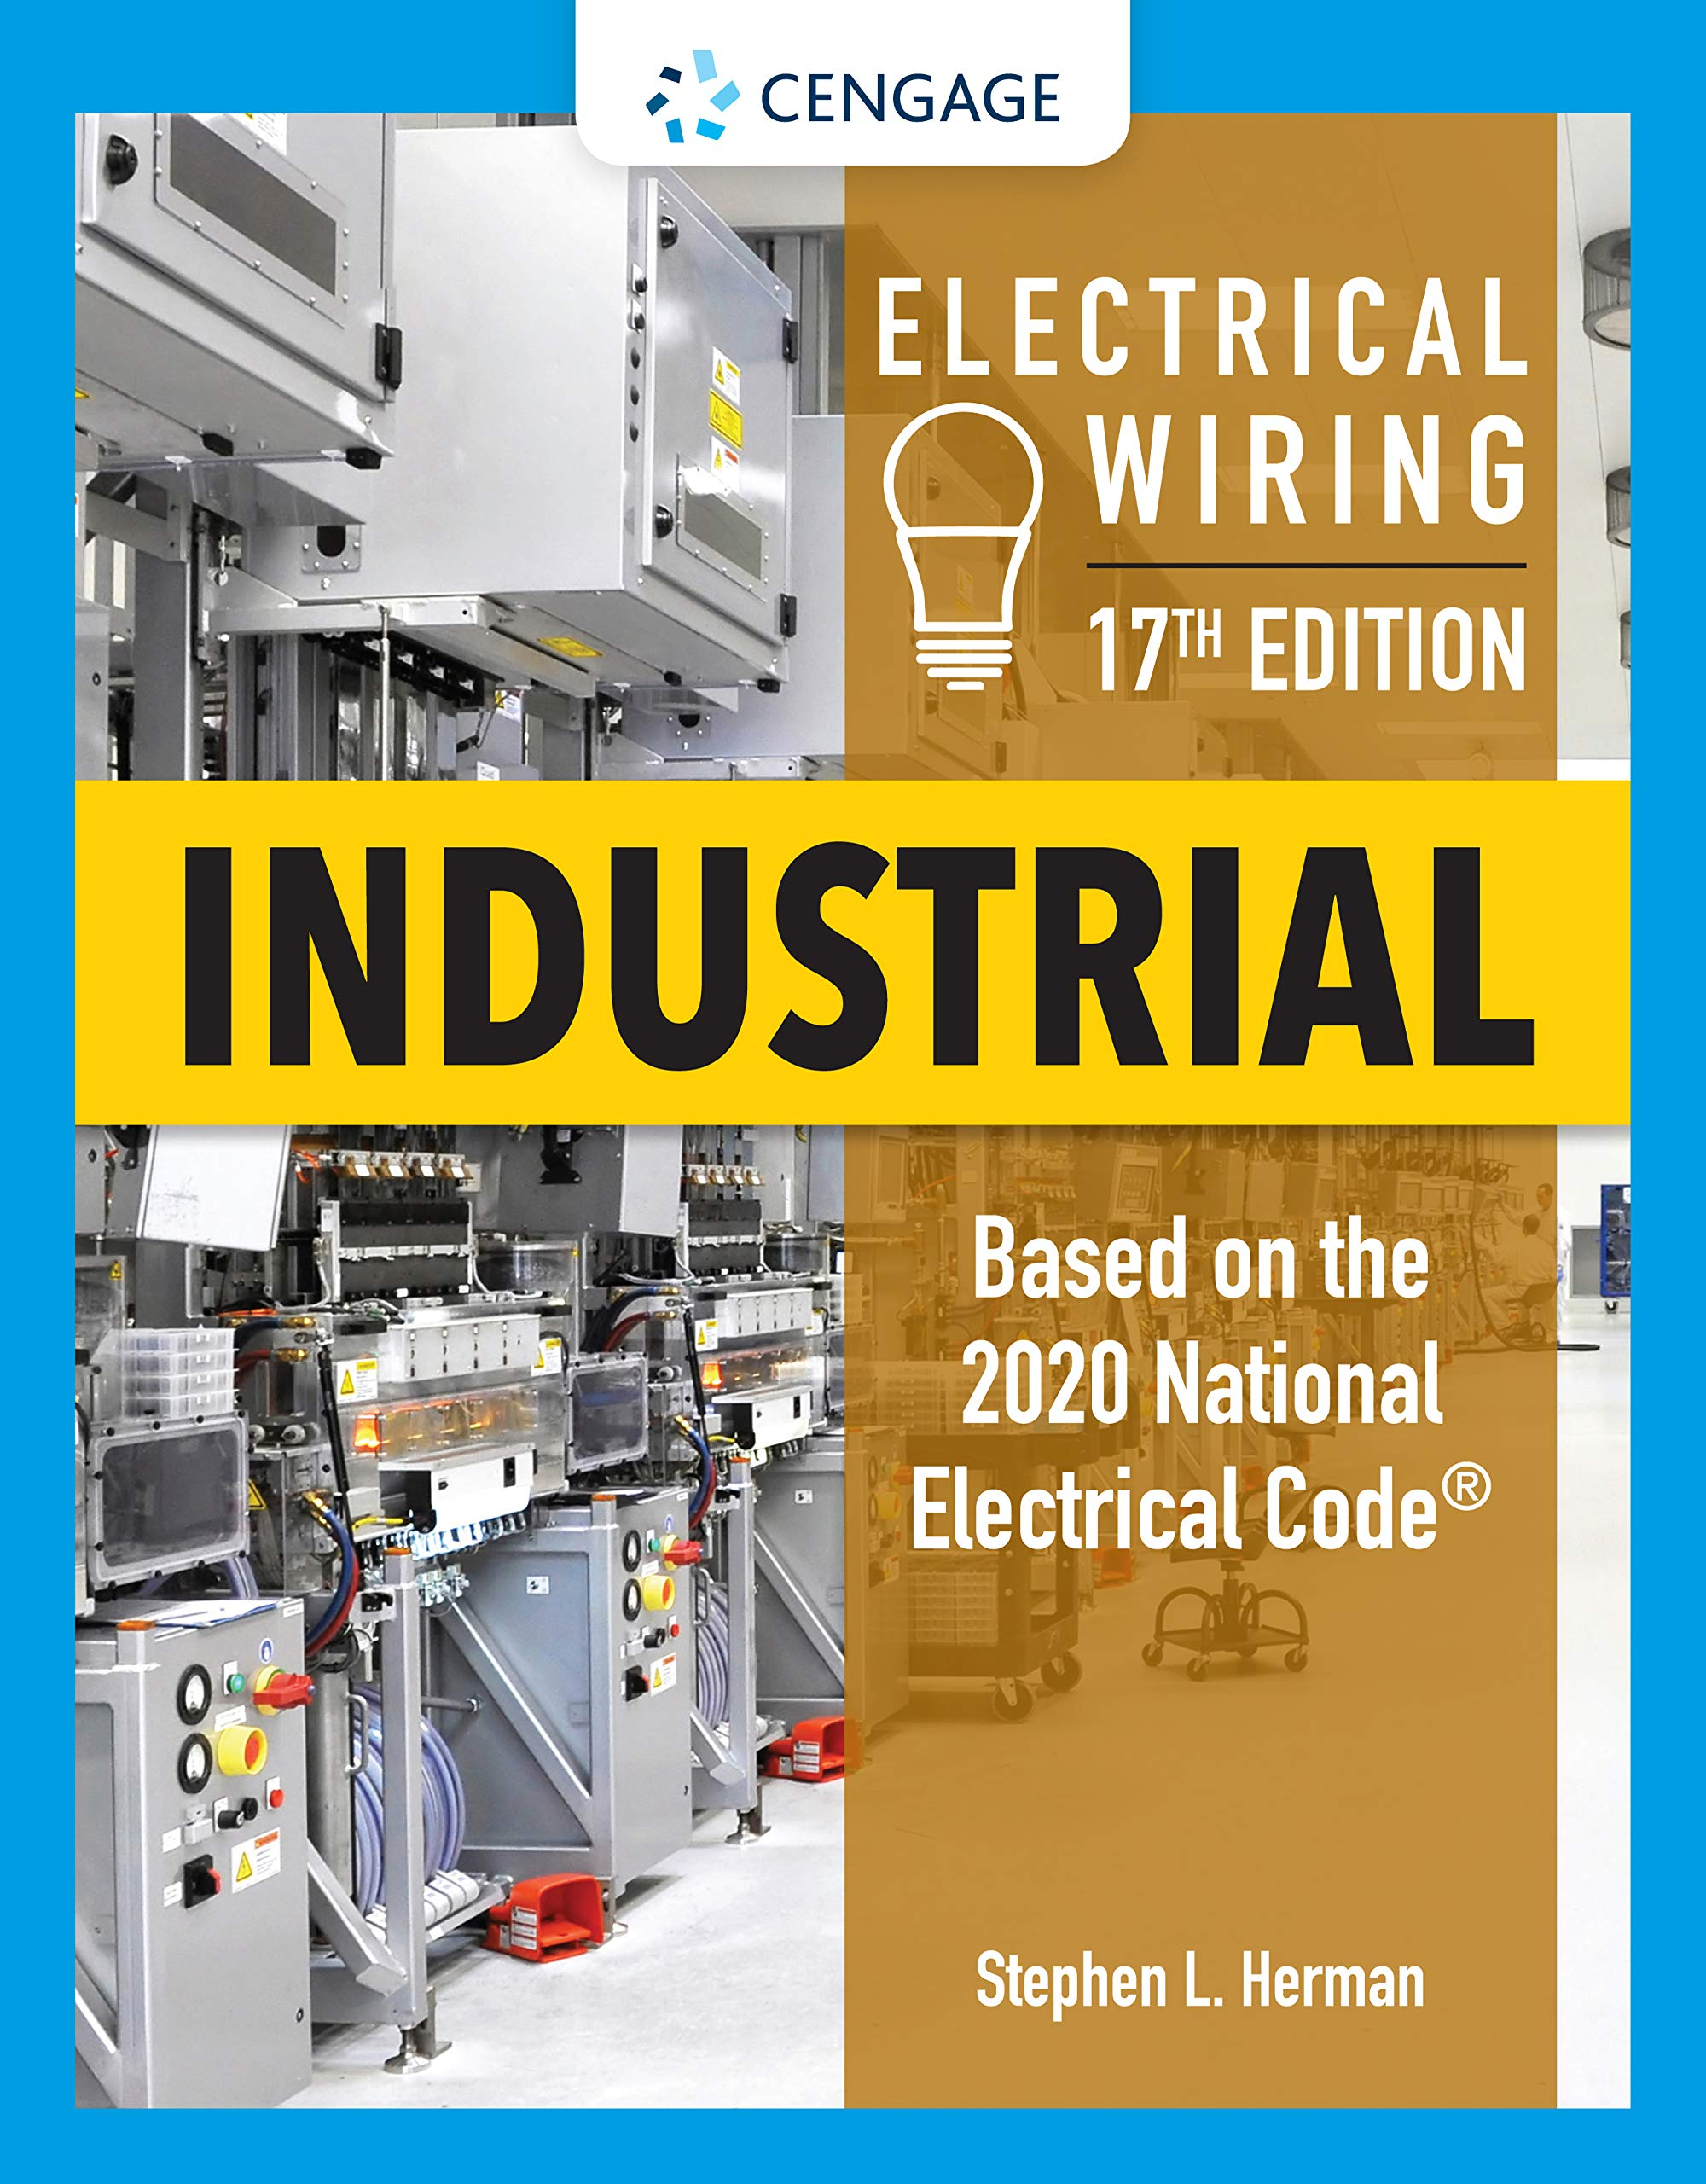 [SCHEMATICS_43NM]  Electrical Wiring Industrial (MindTap Course List), Herman, Stephen L.,  eBook - Amazon.com | Industrial Machine Wiring |  | Amazon.com